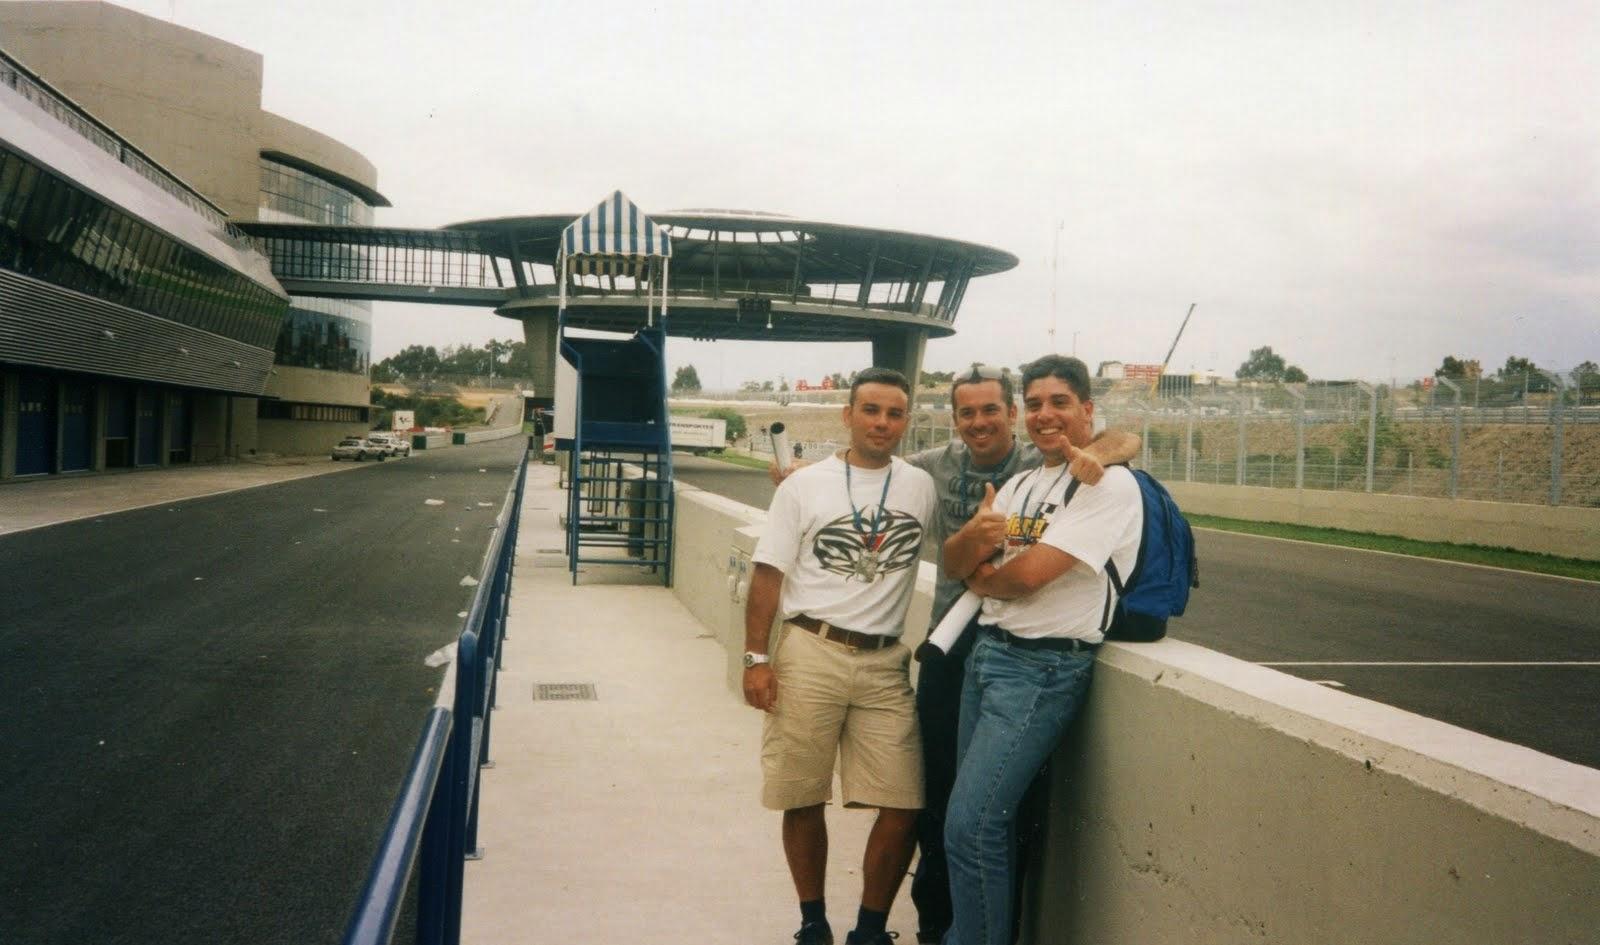 Al fondo el Ovni del circuito de Jerez